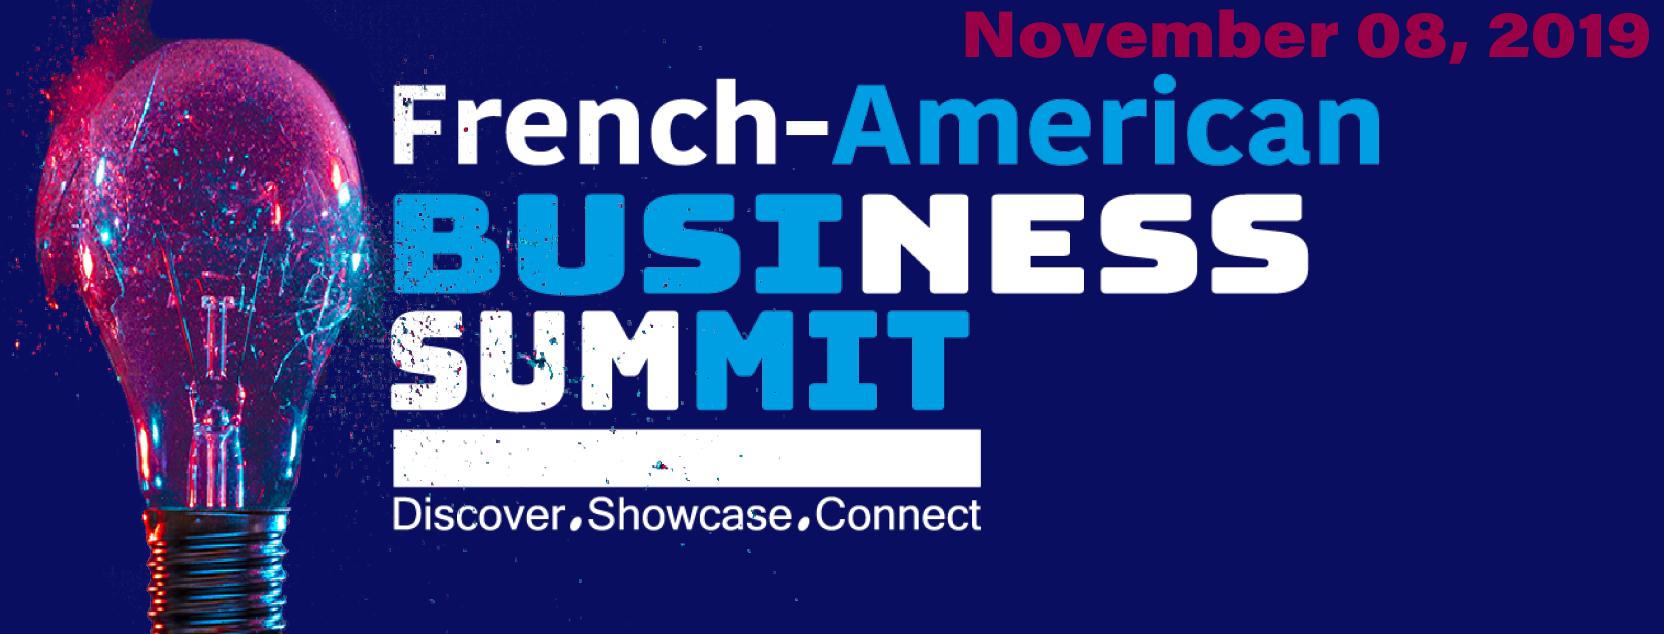 fa-business-summit